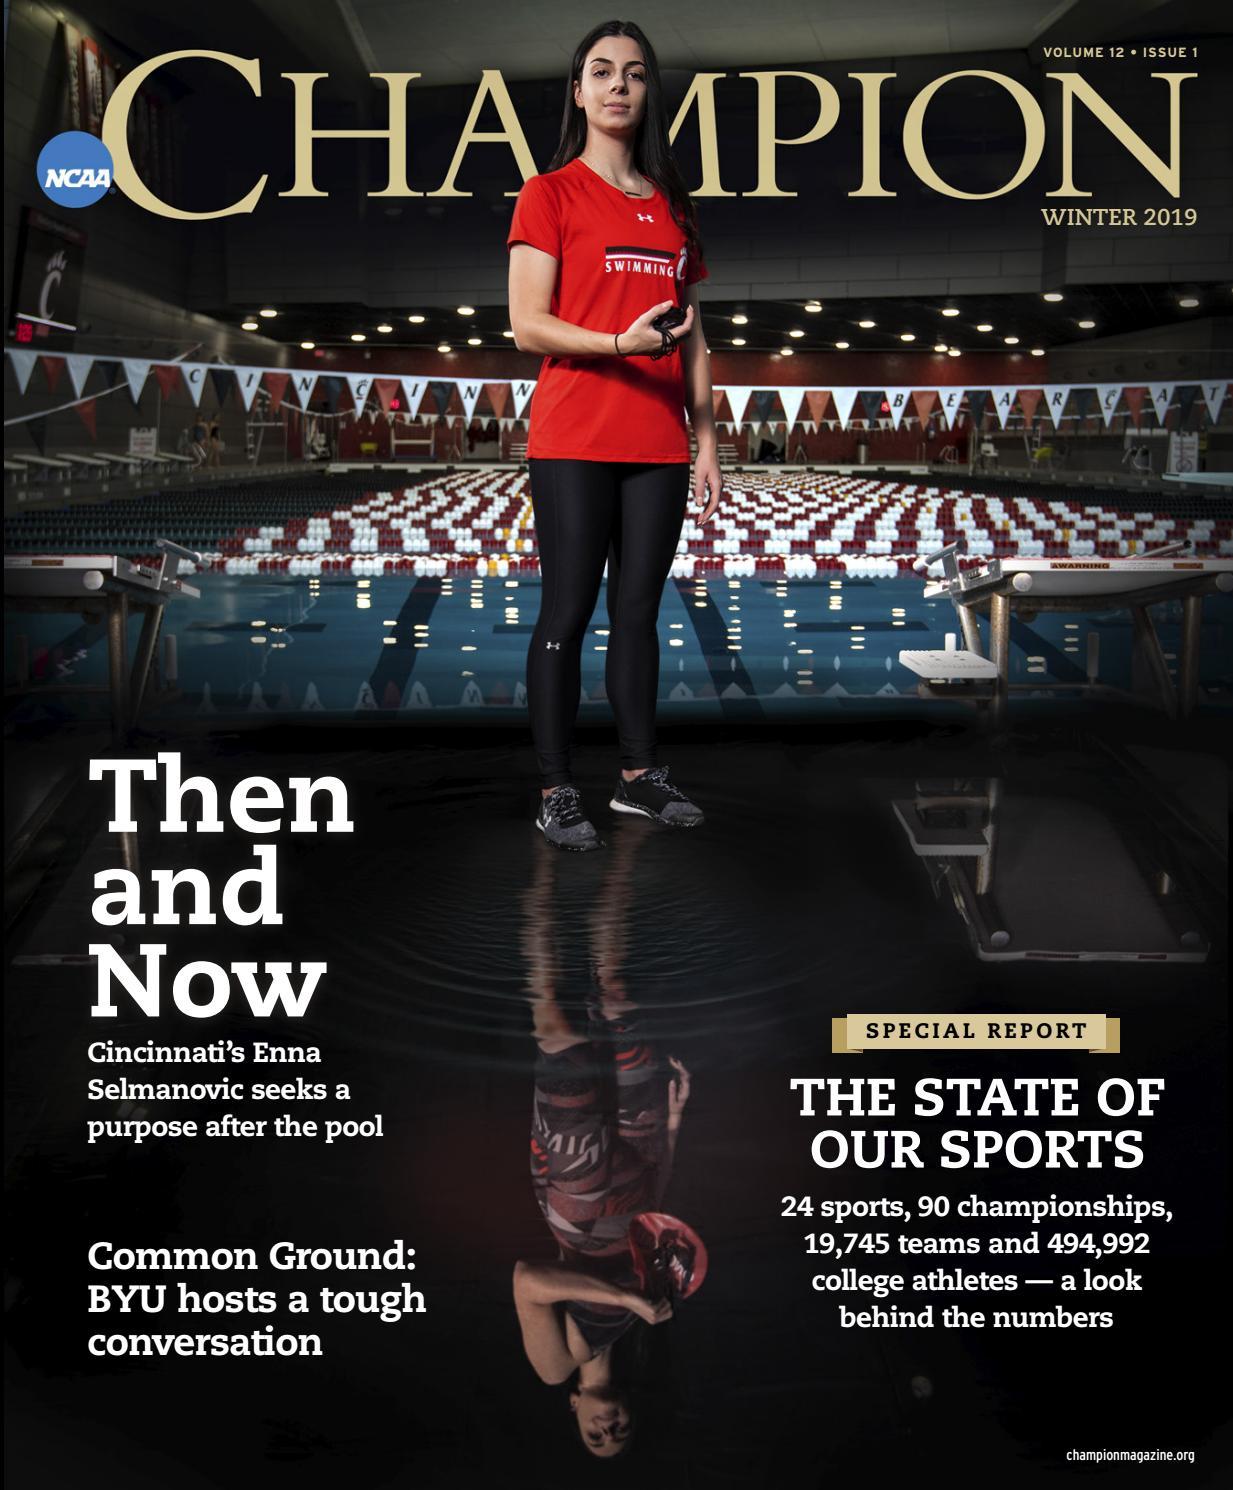 NCAA Champion Magazine Winter 2019 by NCAAChampion issuu